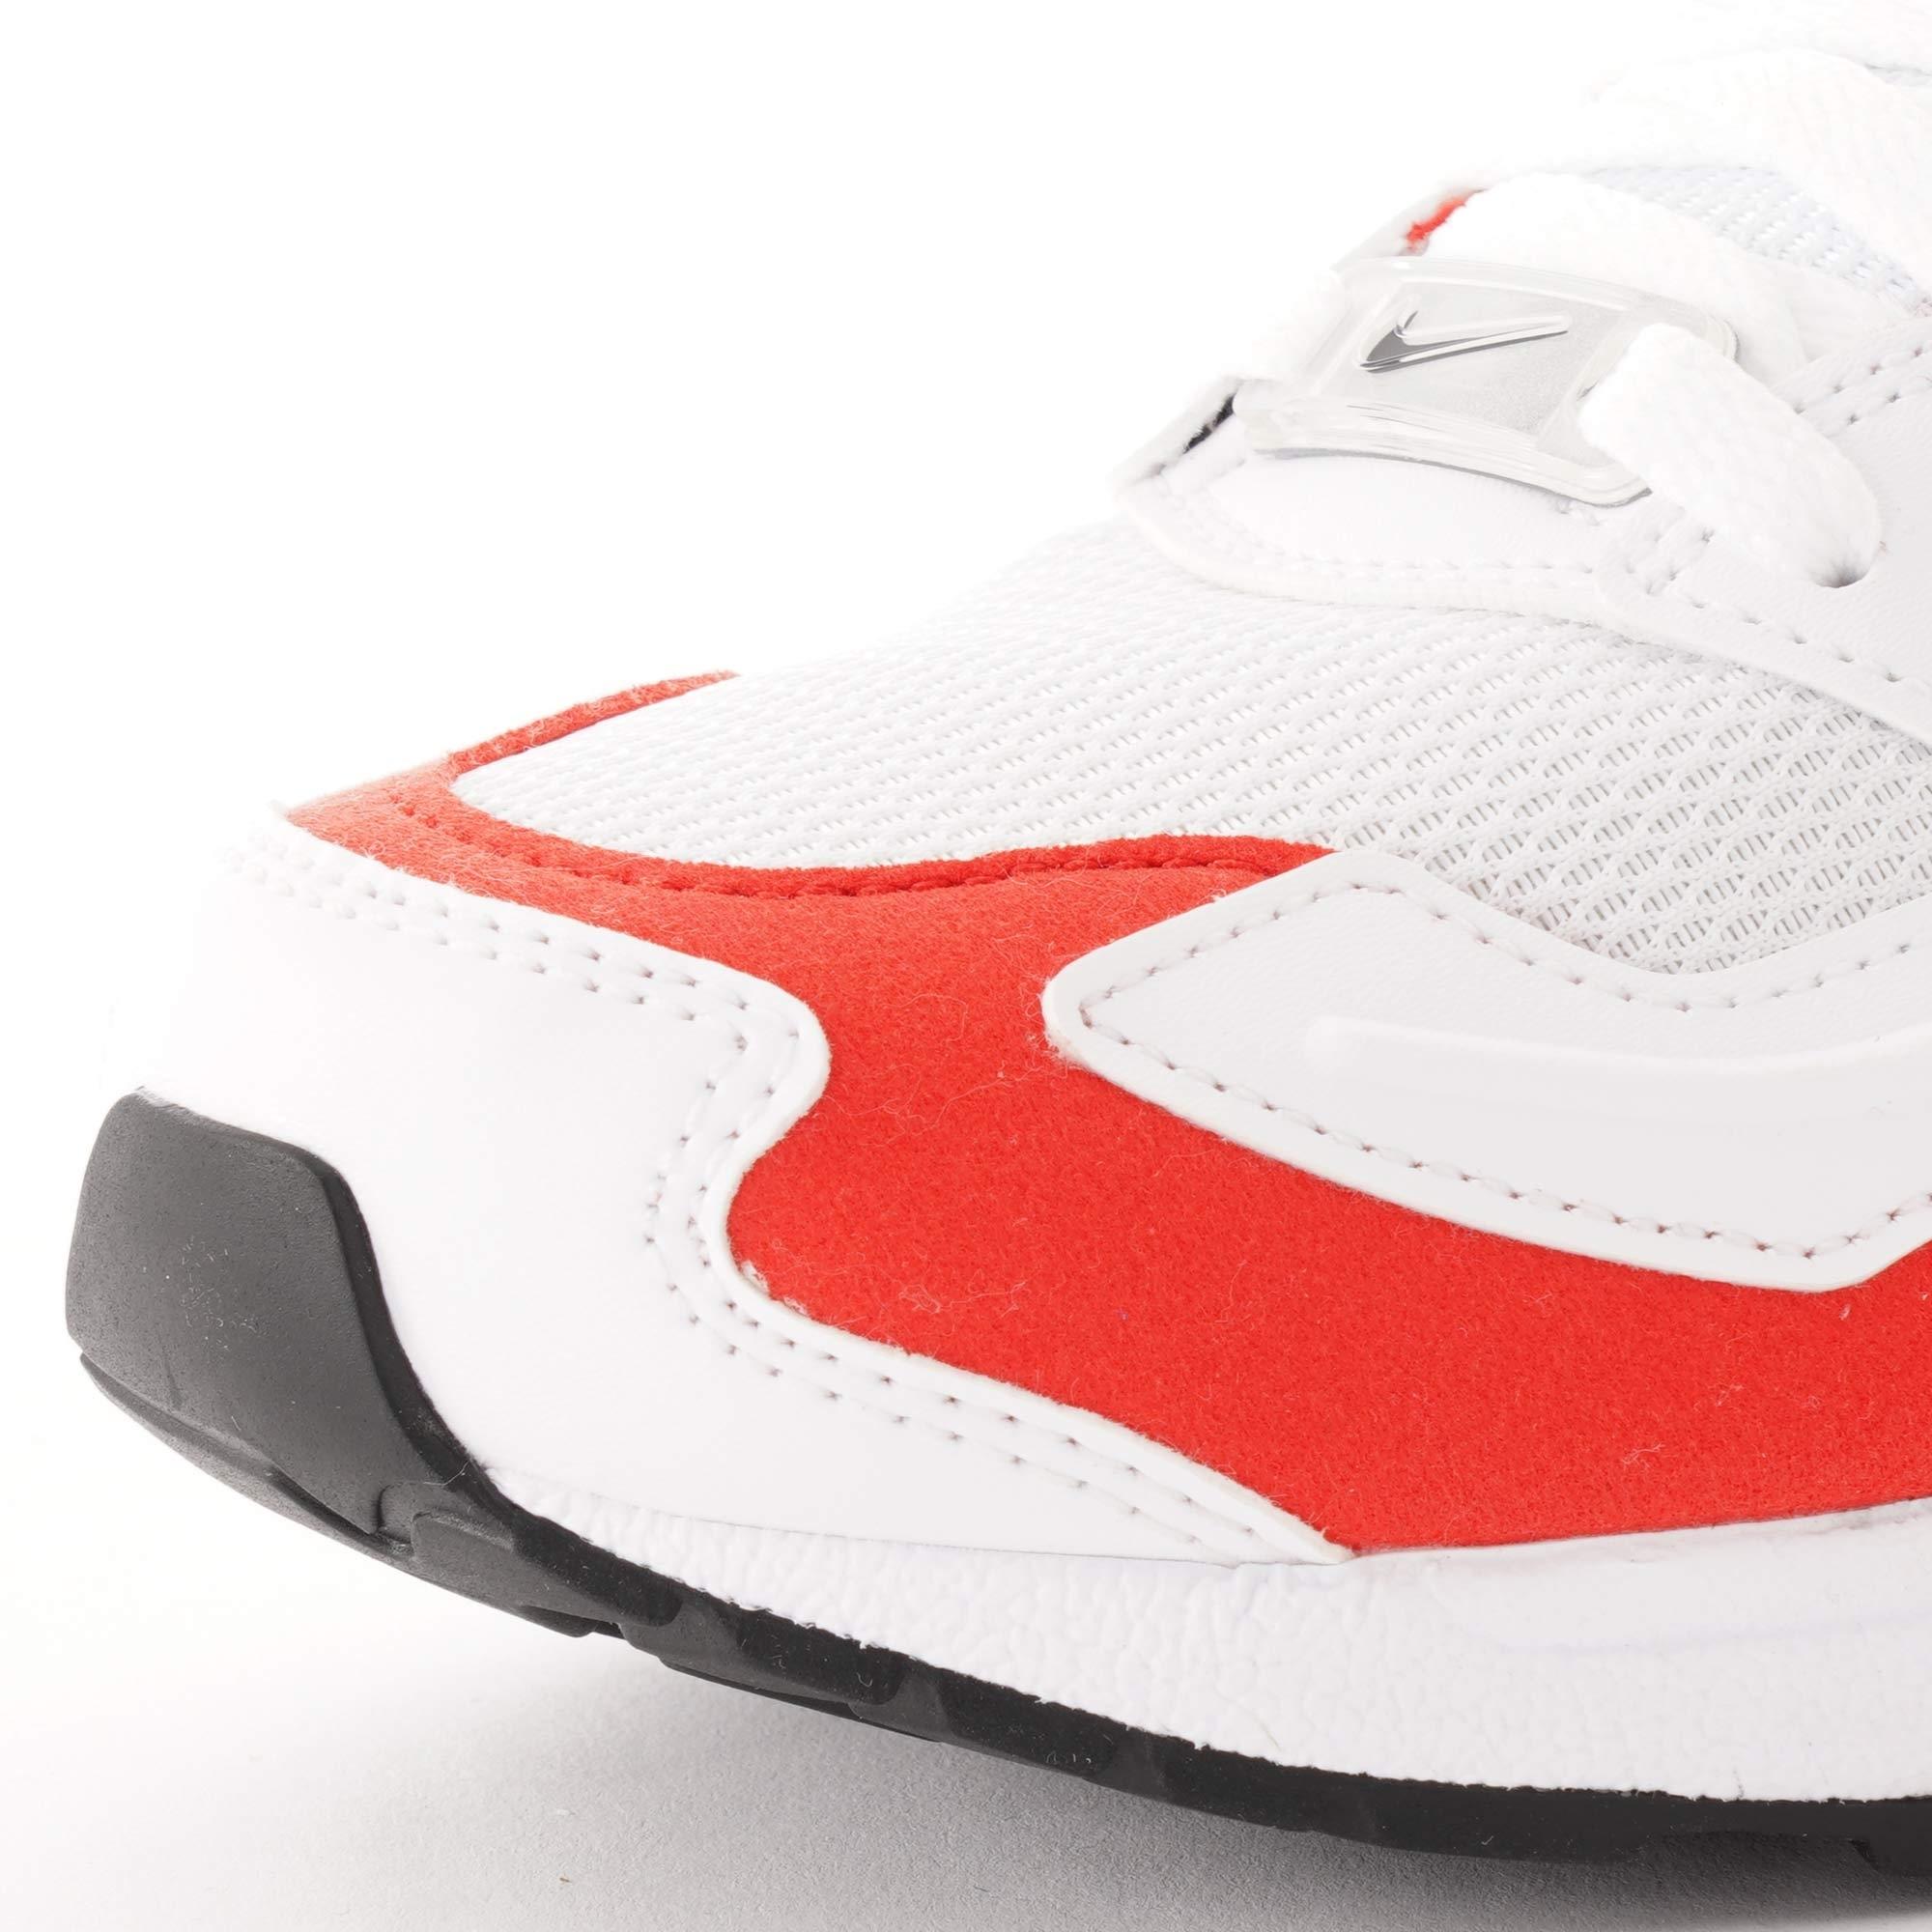 Air Max2 Light White, Black & Habanero Red